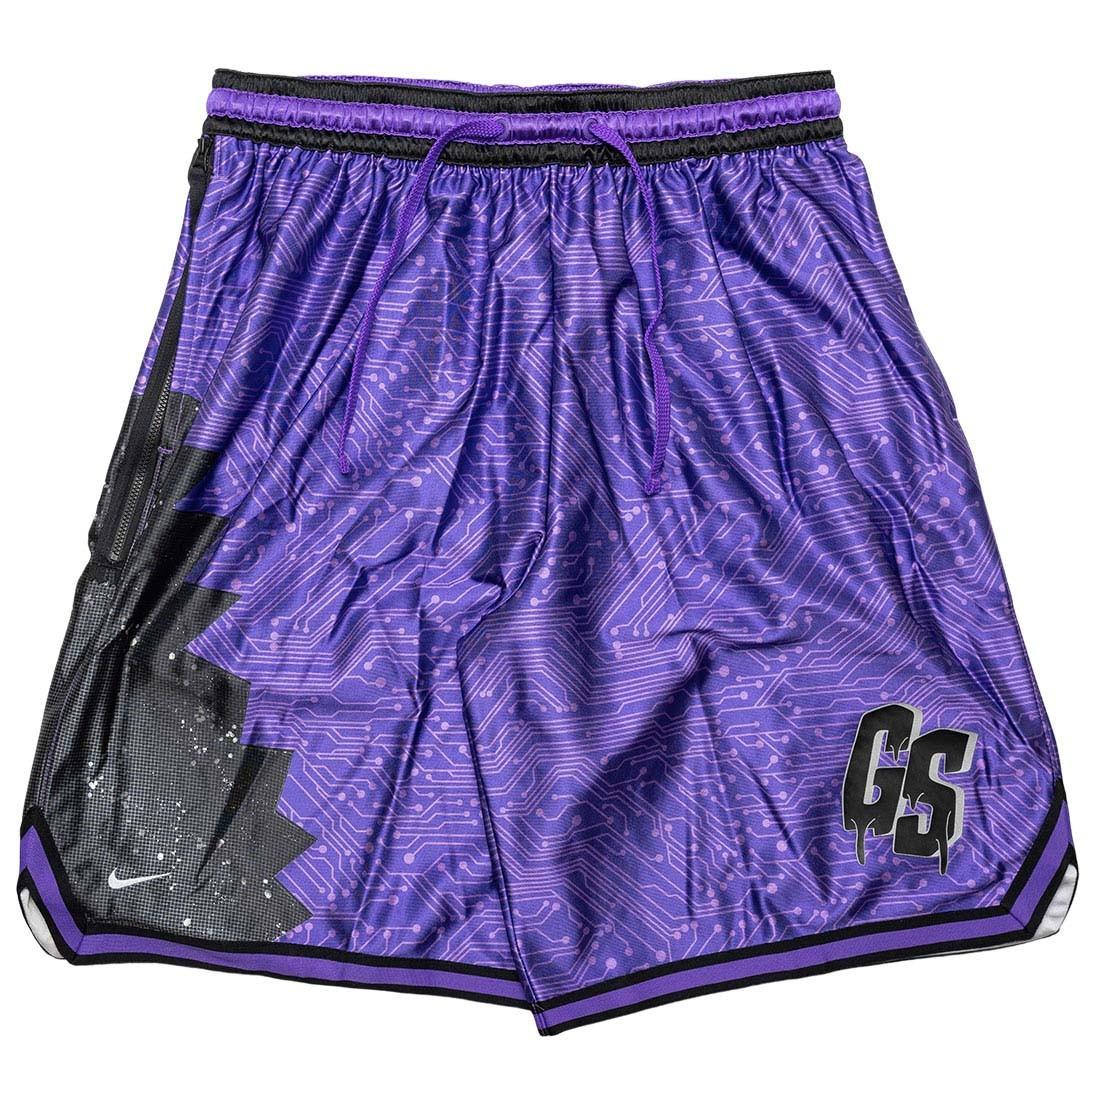 Nike Men Lebron X Space Jam: A New Legacy Goon Squad Shorts (hyper grape / black / wolf grey)